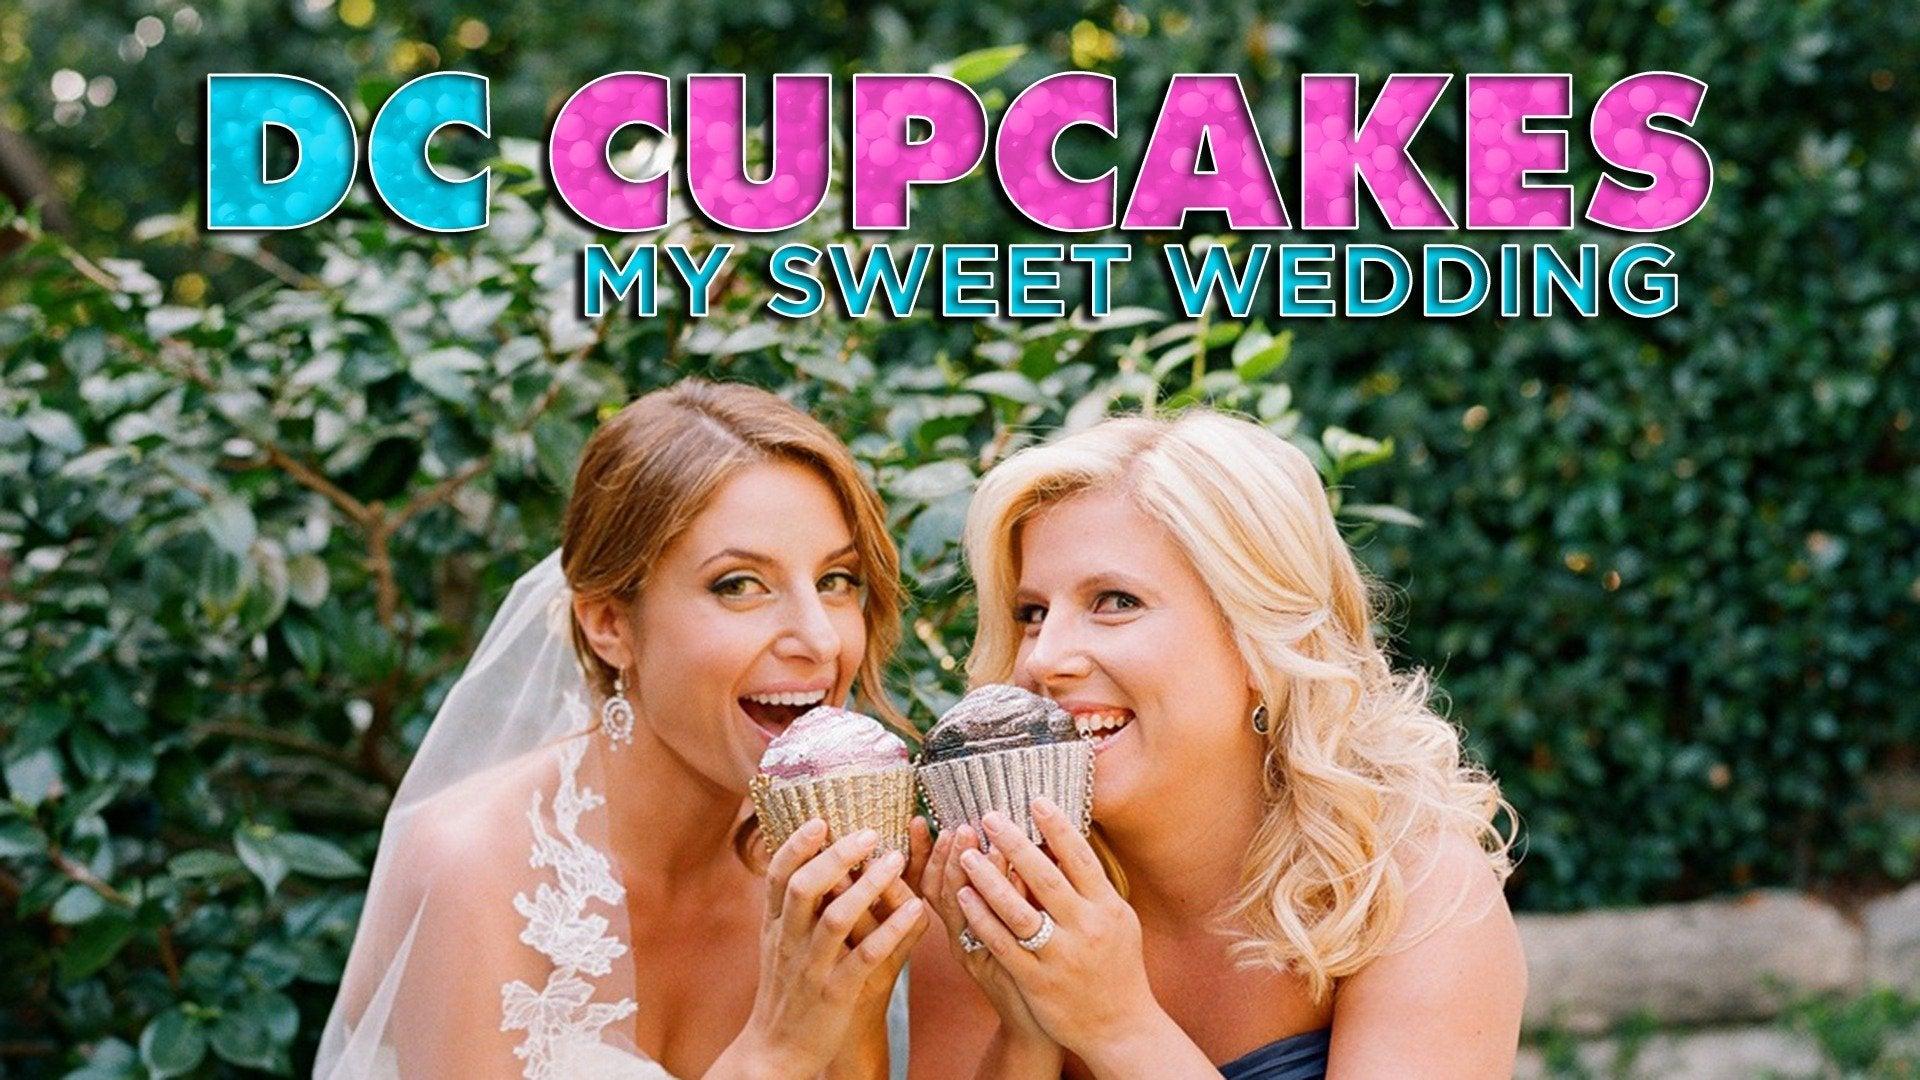 DC Cupcakes: My Sweet Wedding